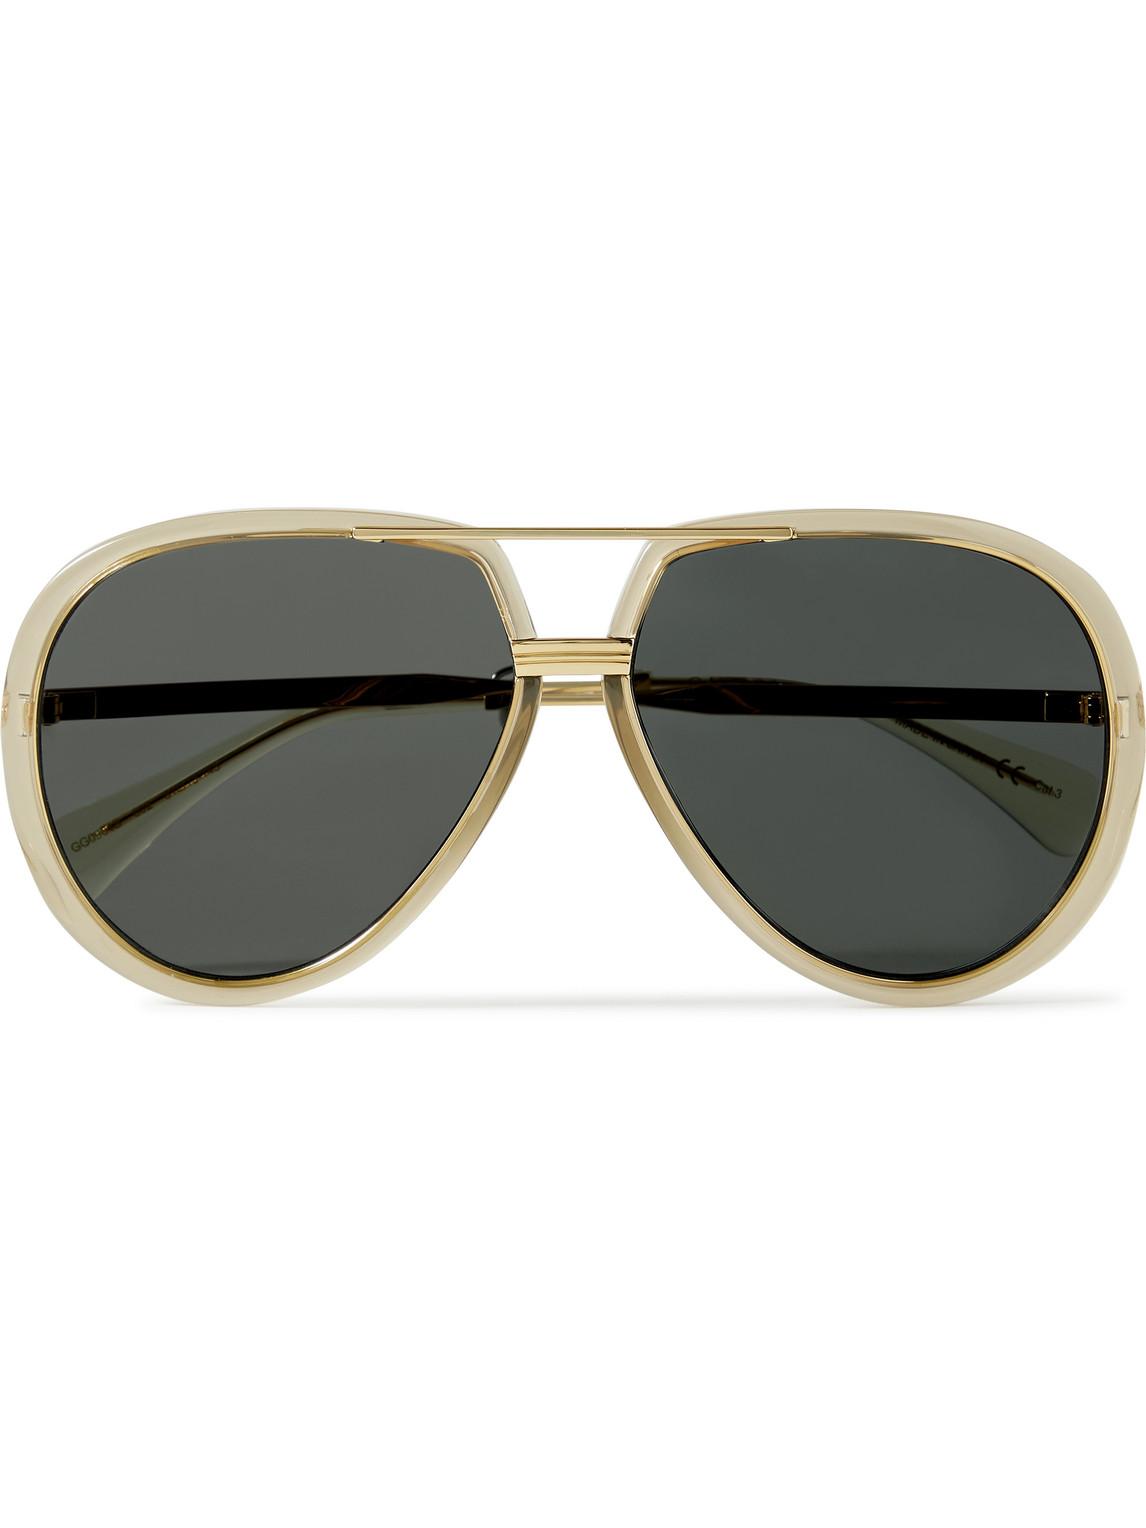 Gucci - Aviator-Style Acetate And Gold-Tone Sunglasses - Men - Green